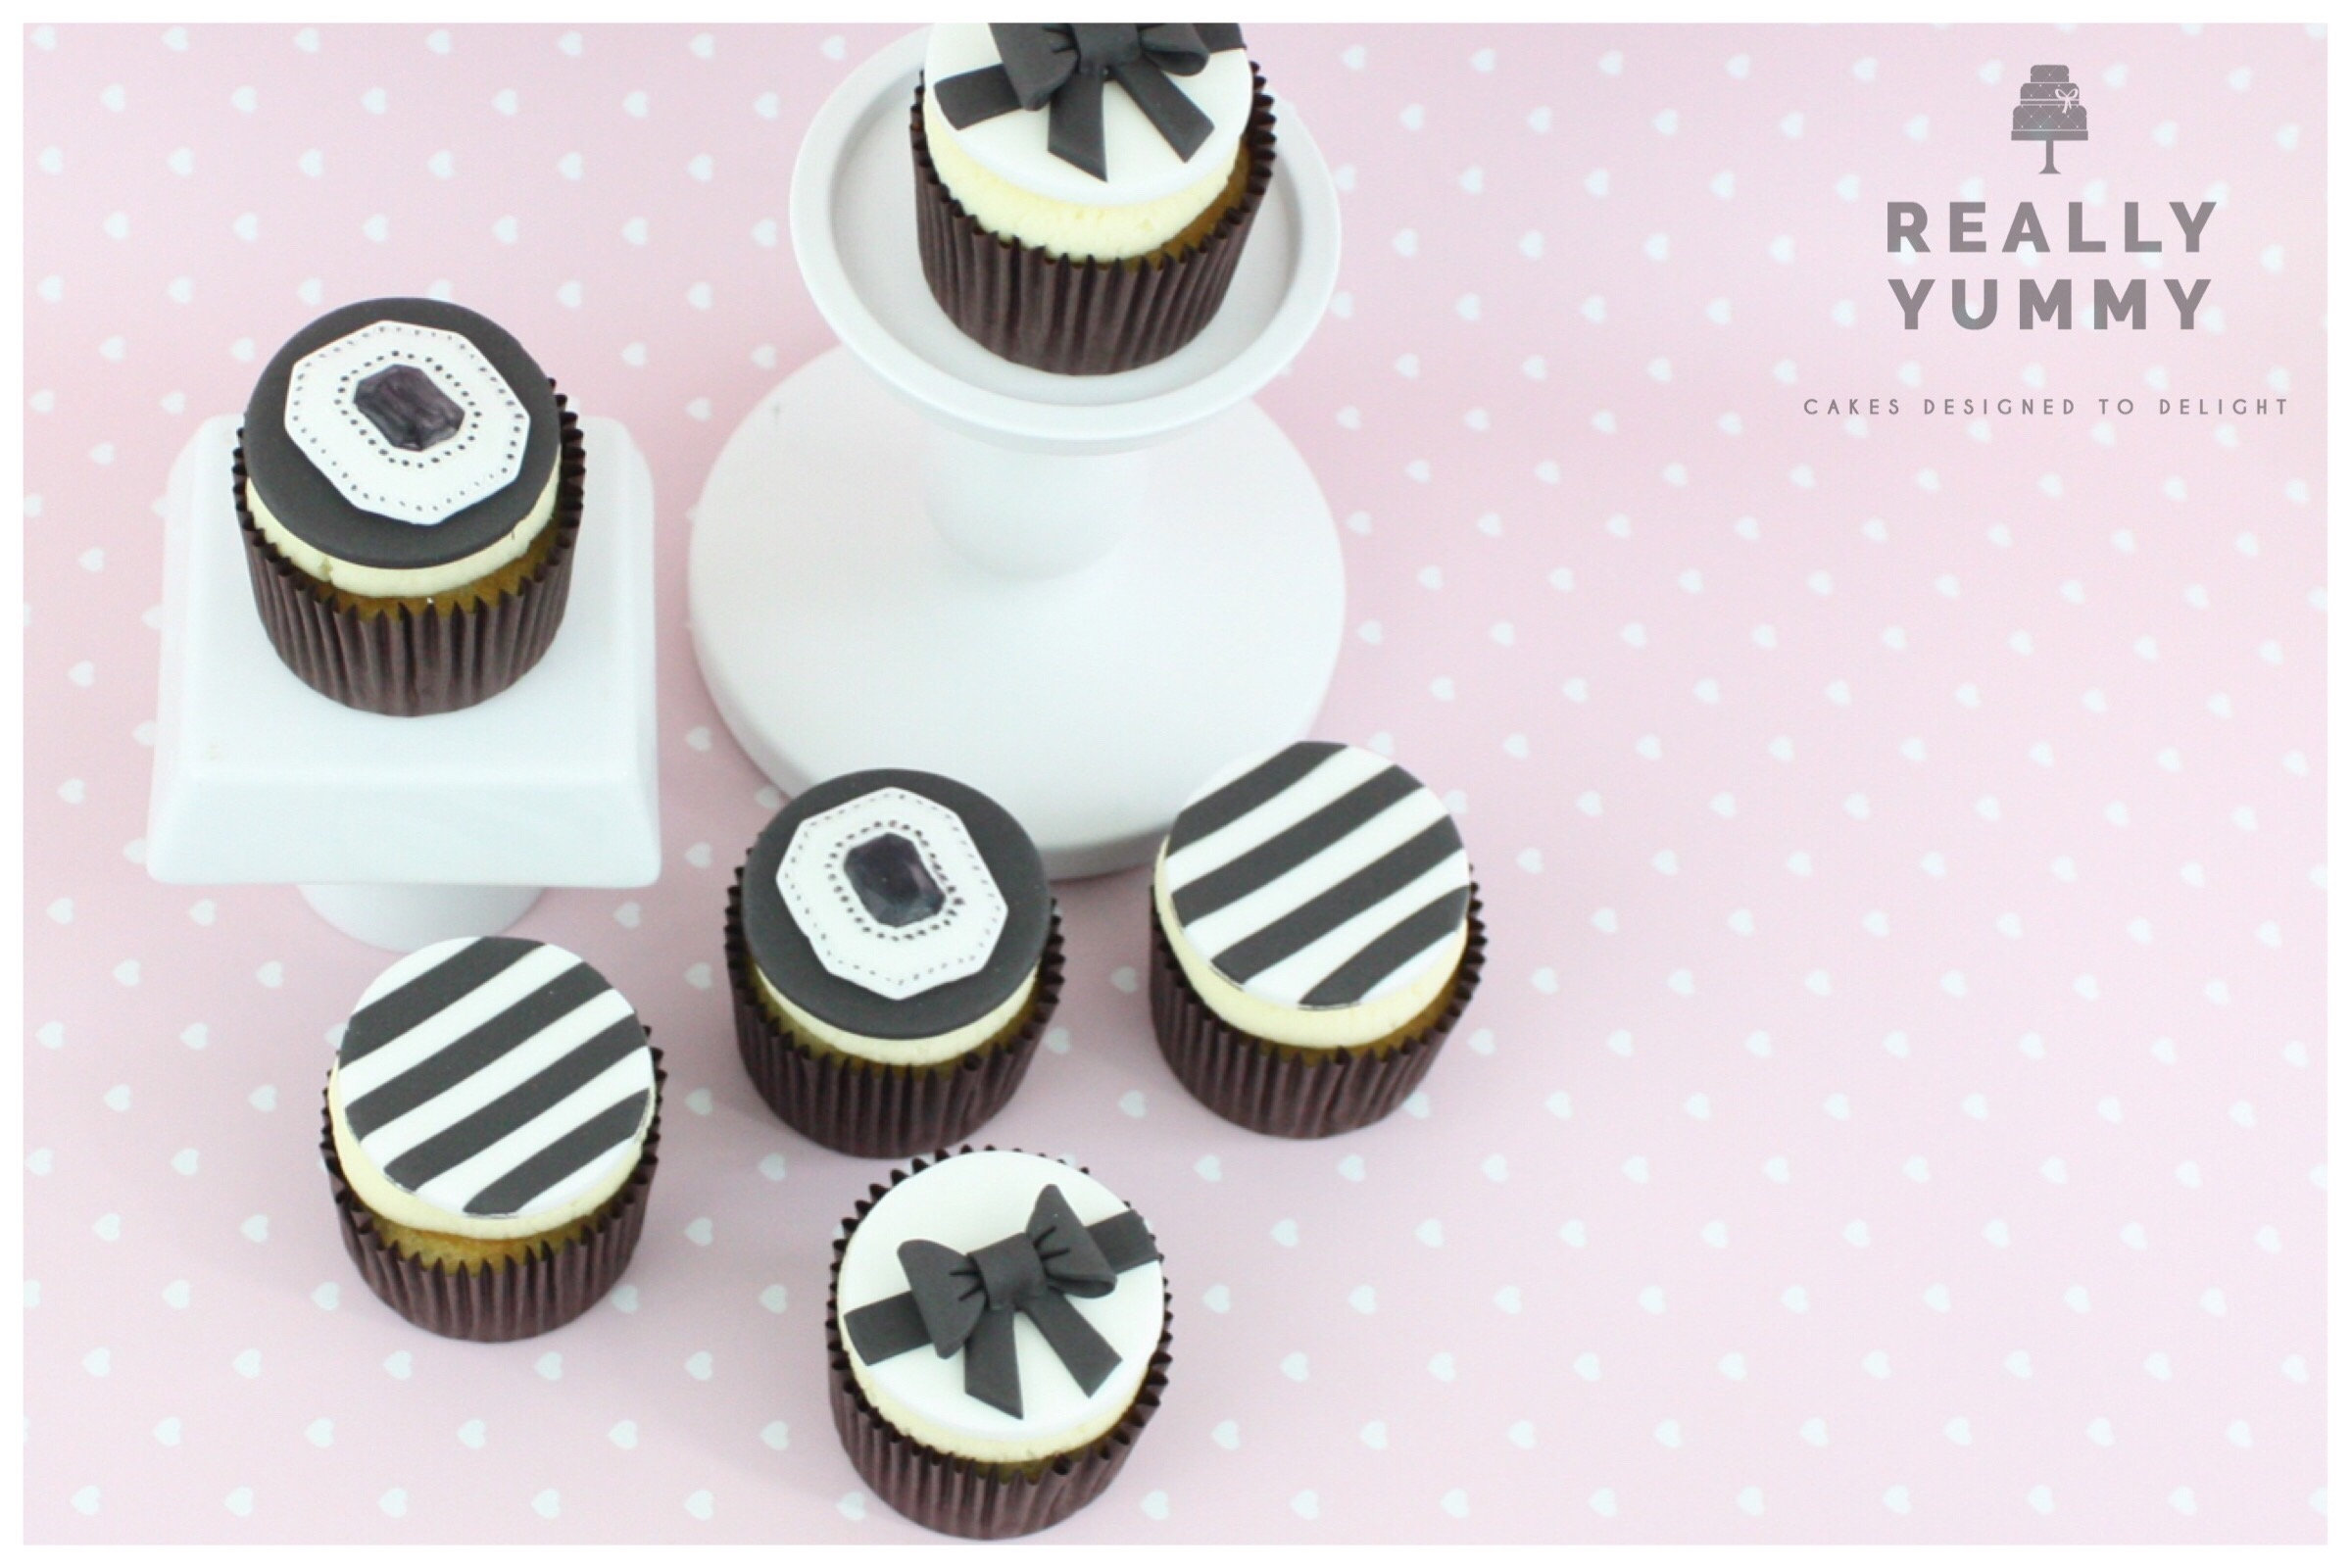 Monochrome cupcakes